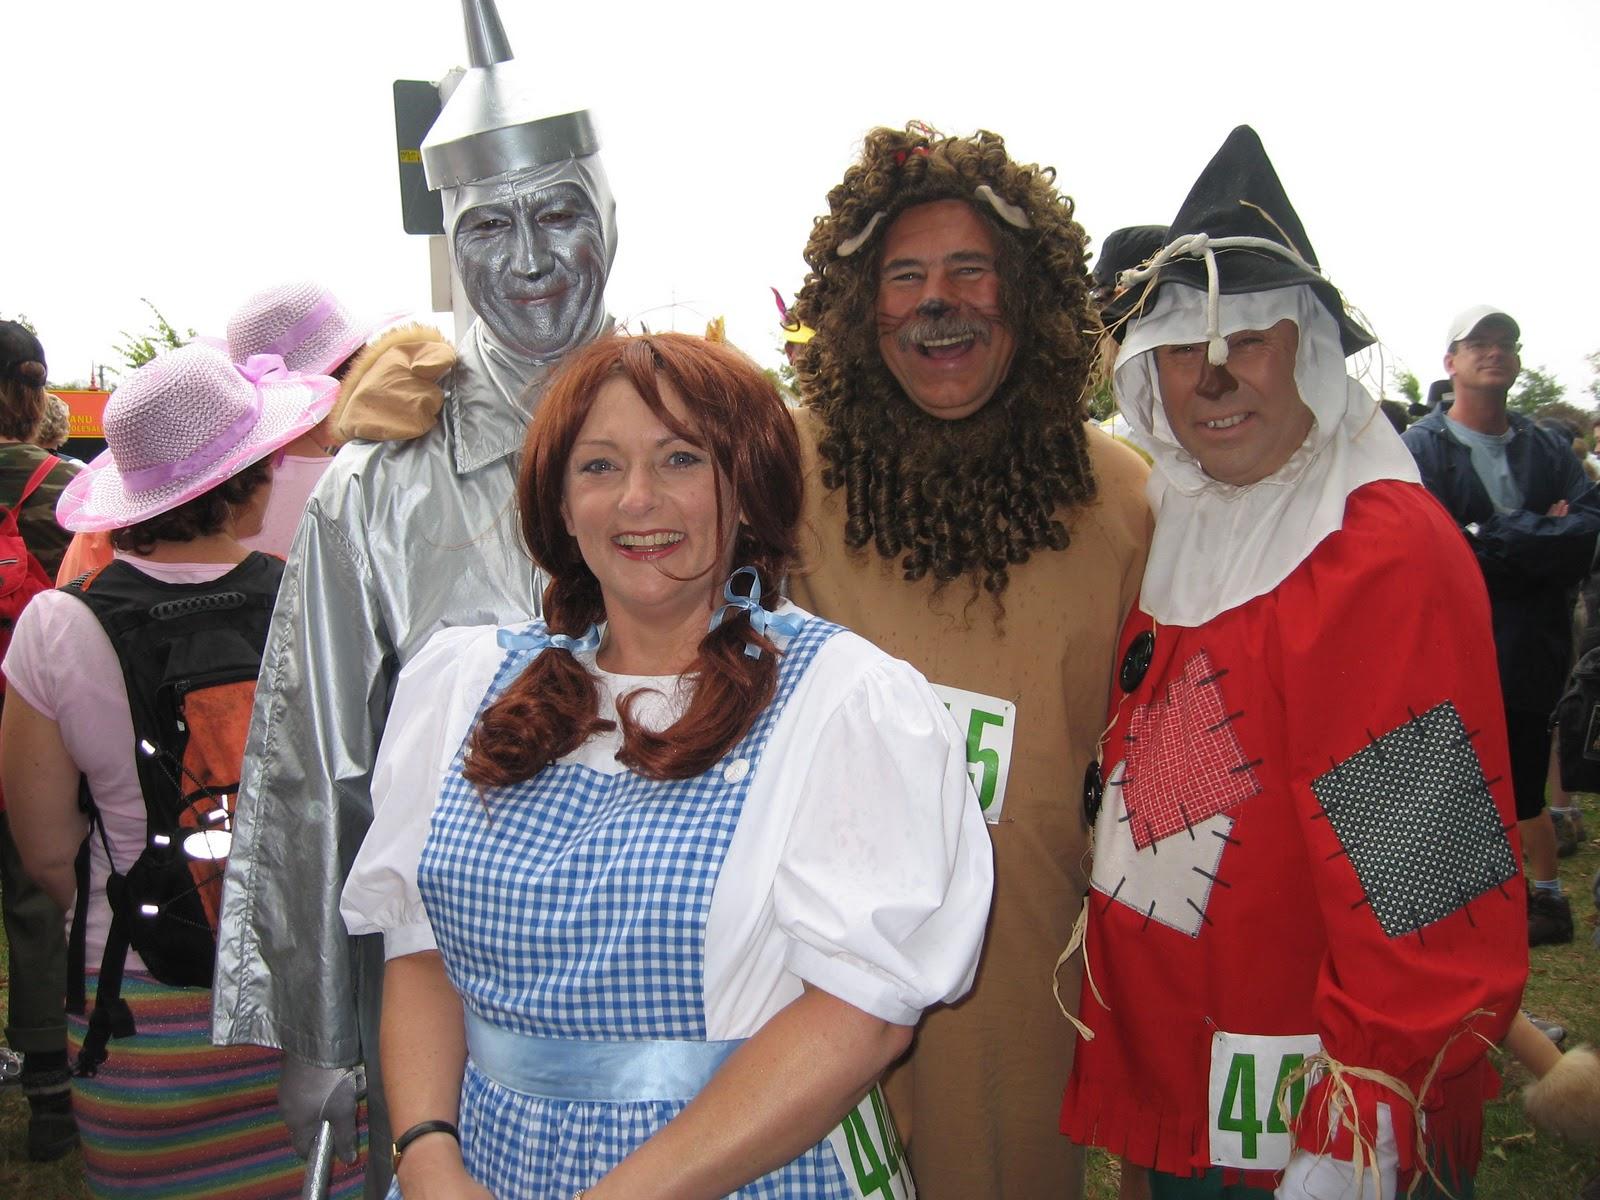 Costume ideas for groups - Group Costume Ideas Diy Halloween